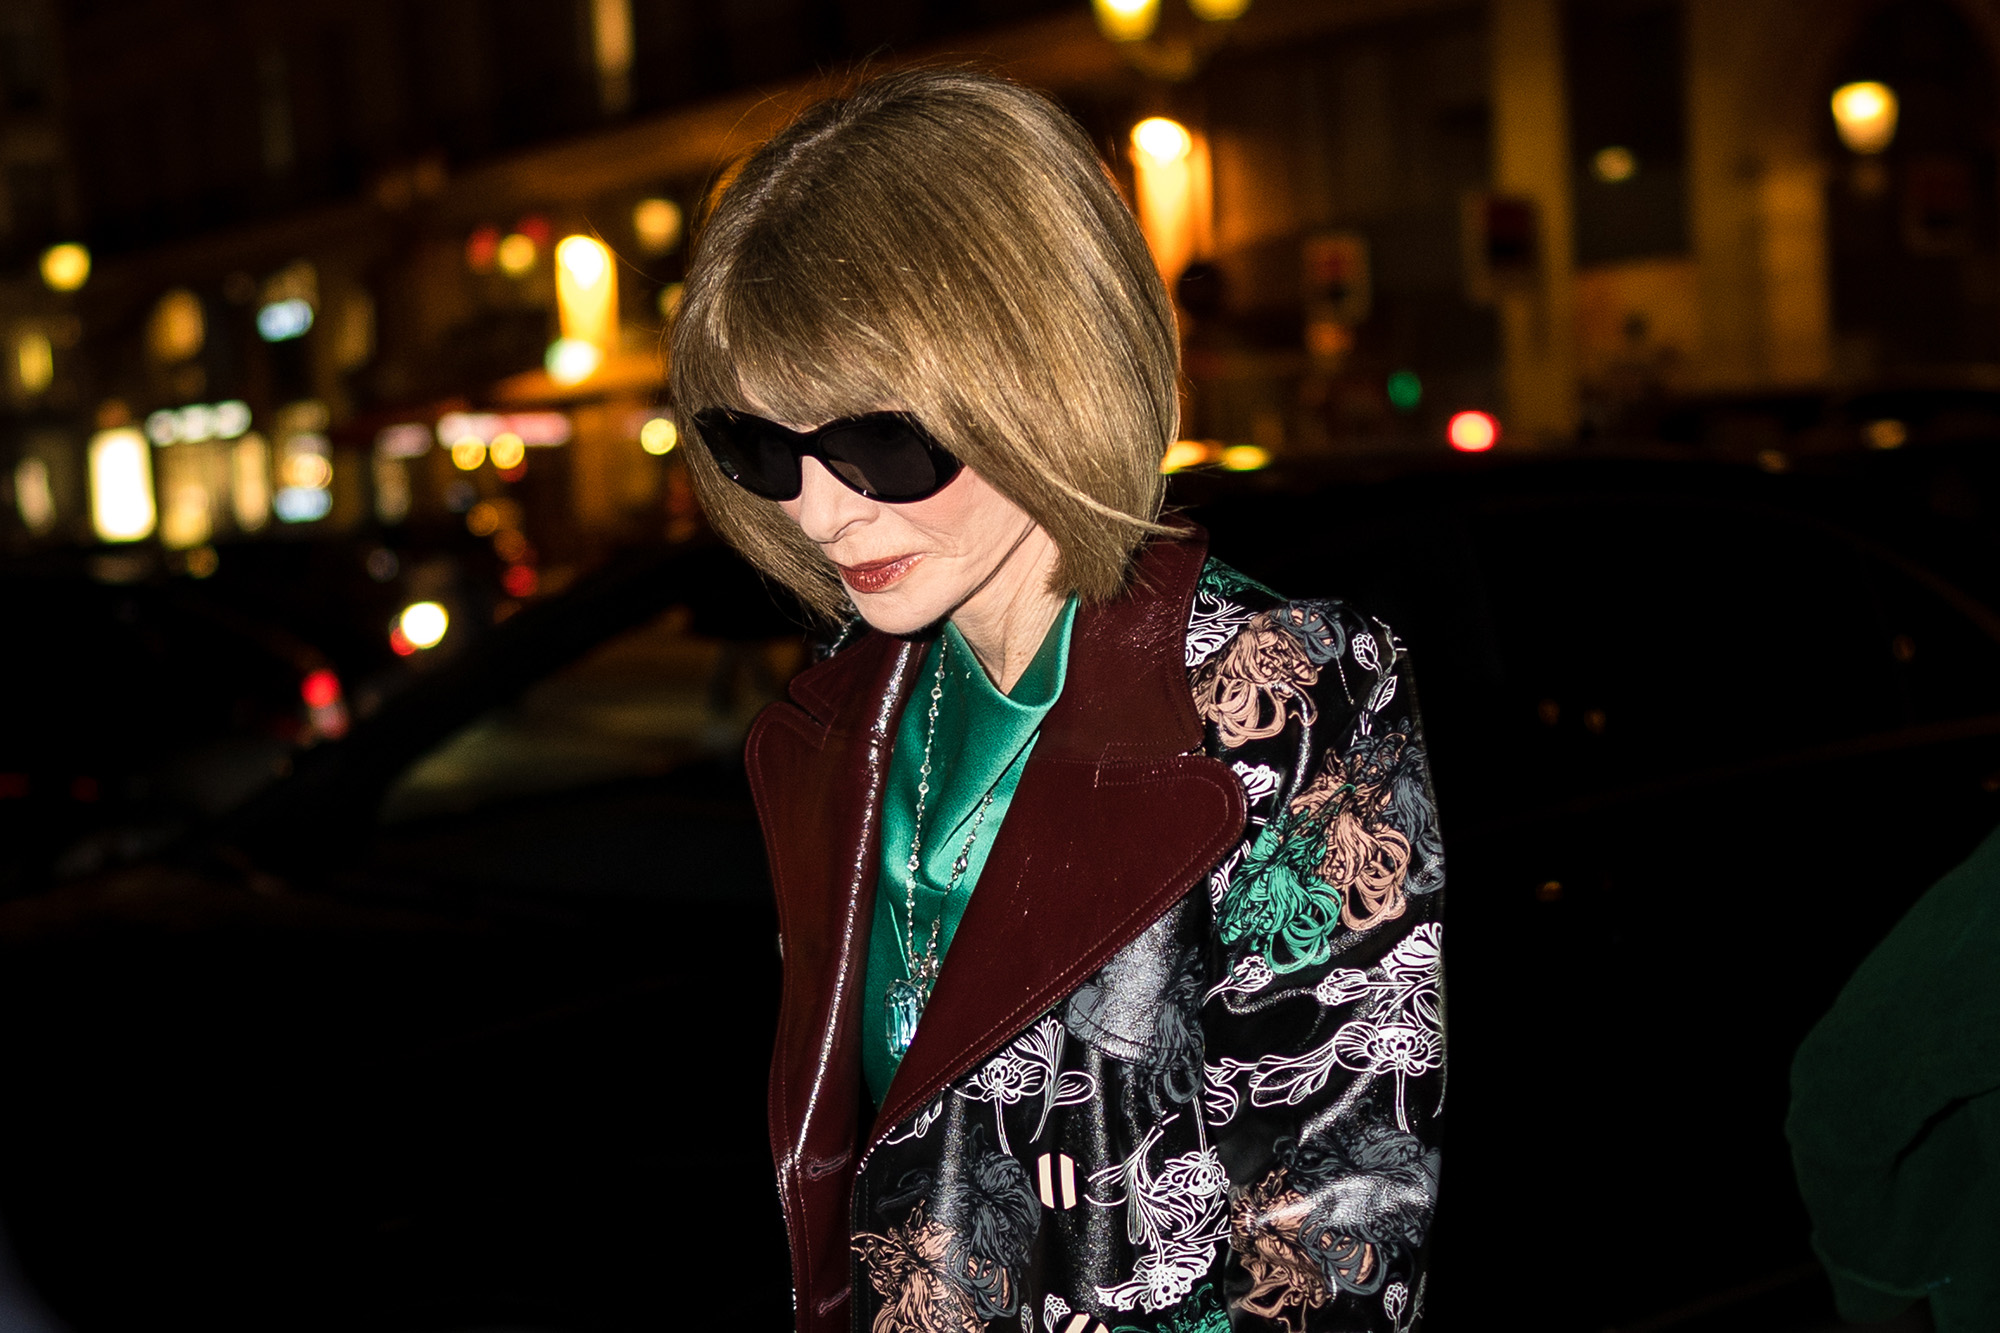 Vogue head Anna Wintour cops to intolerant past in expose